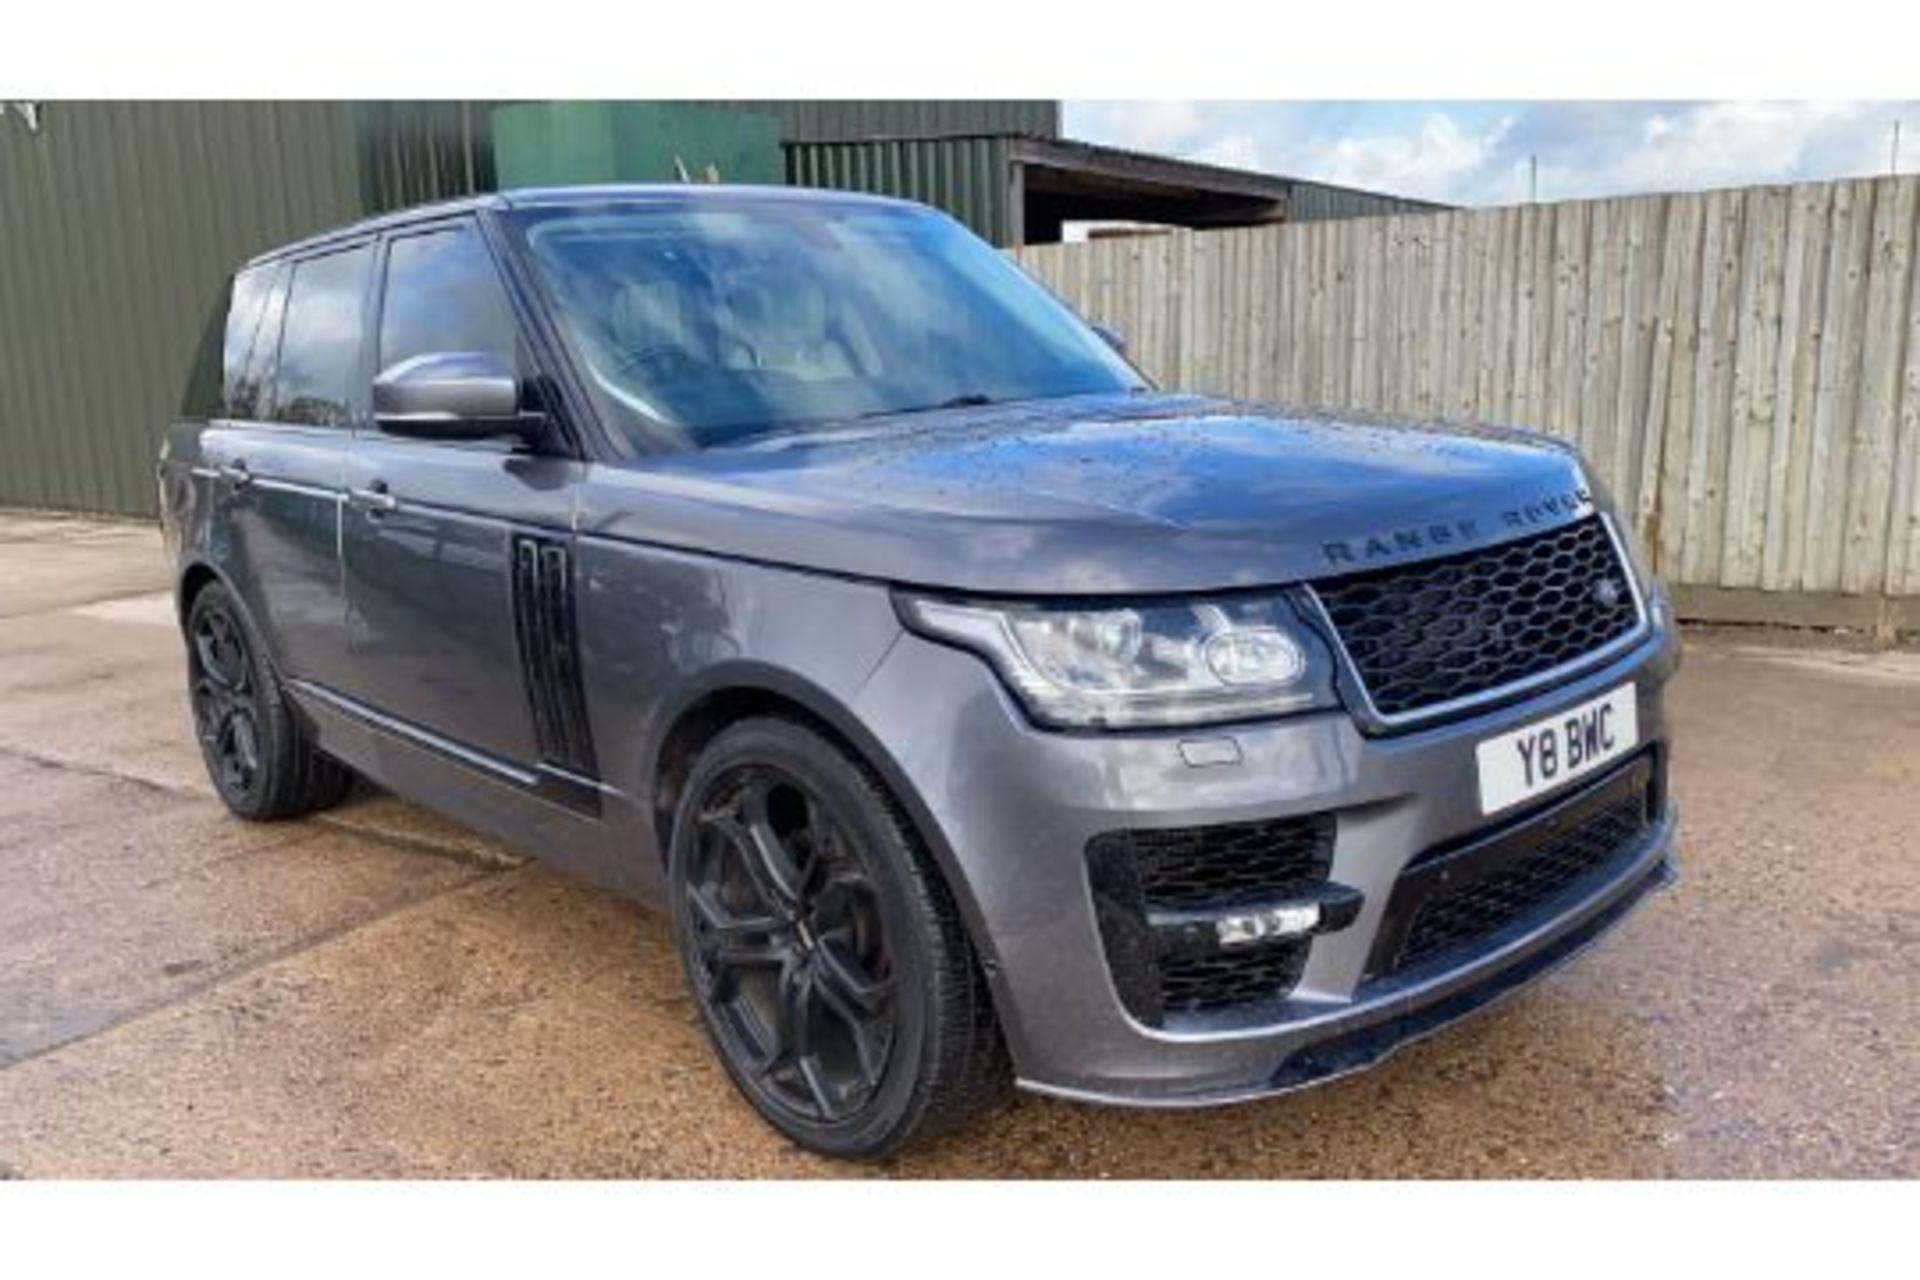 Range Rover Vogue 3.0 TDV6 SE Auto - Black Pack - NEW SHAPE - FULLY LOADED - Pan Roof - Image 2 of 30